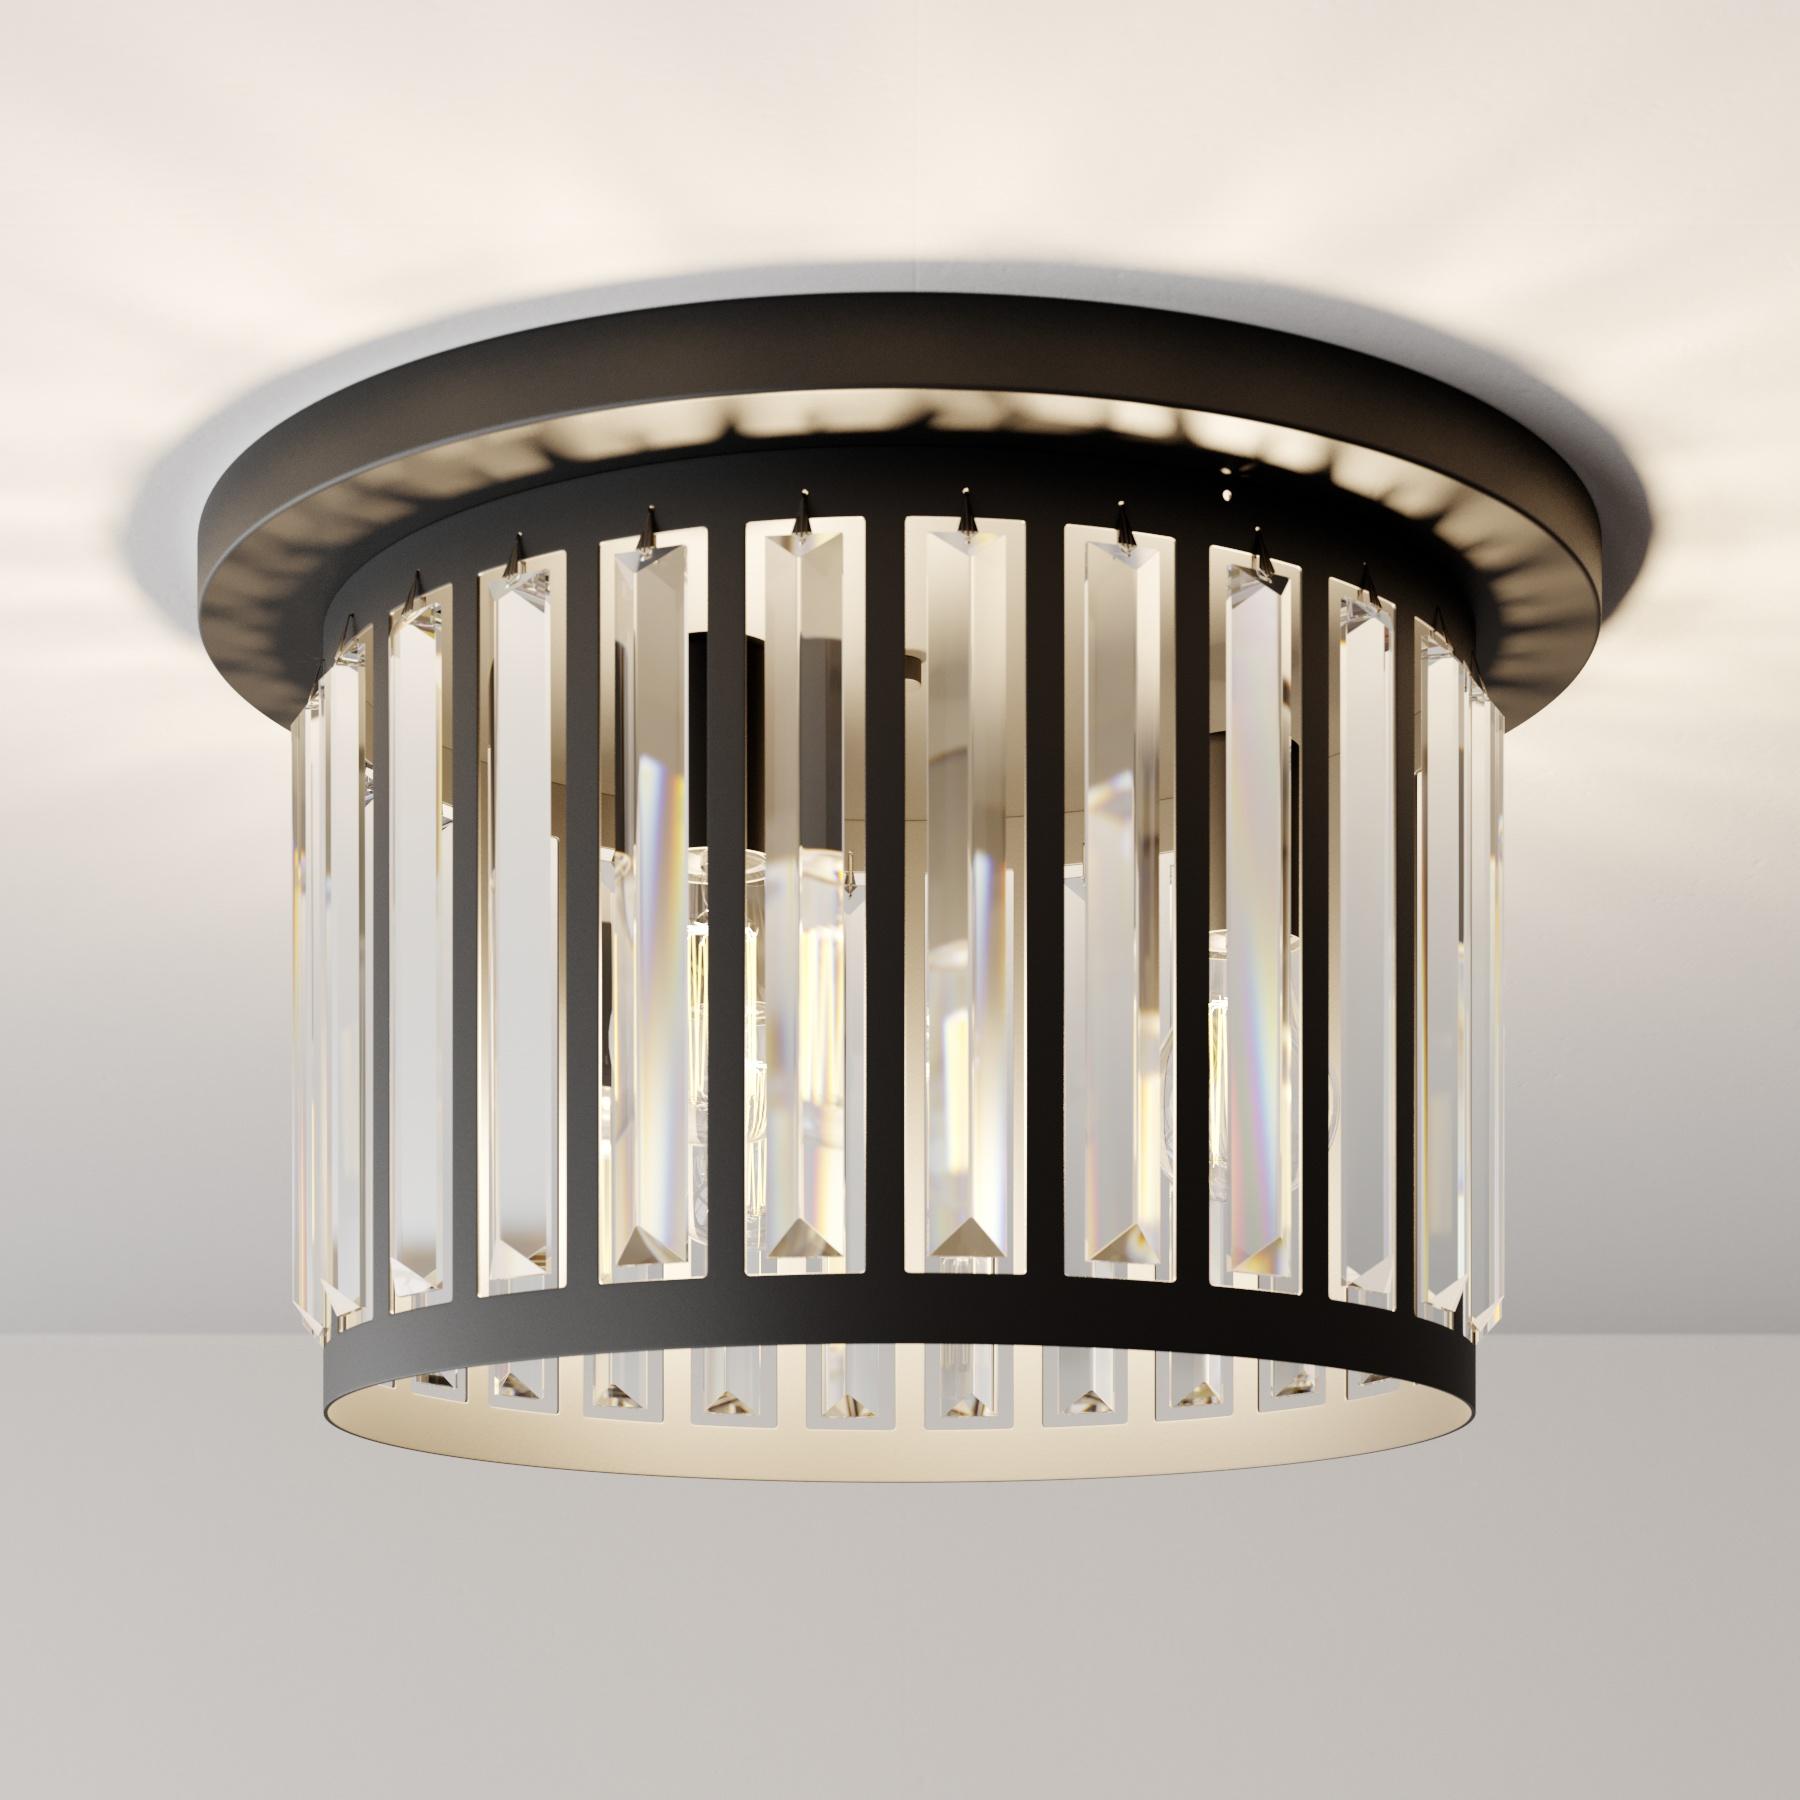 Lampa sufitowa Elevato, Ø 44cm, czarna